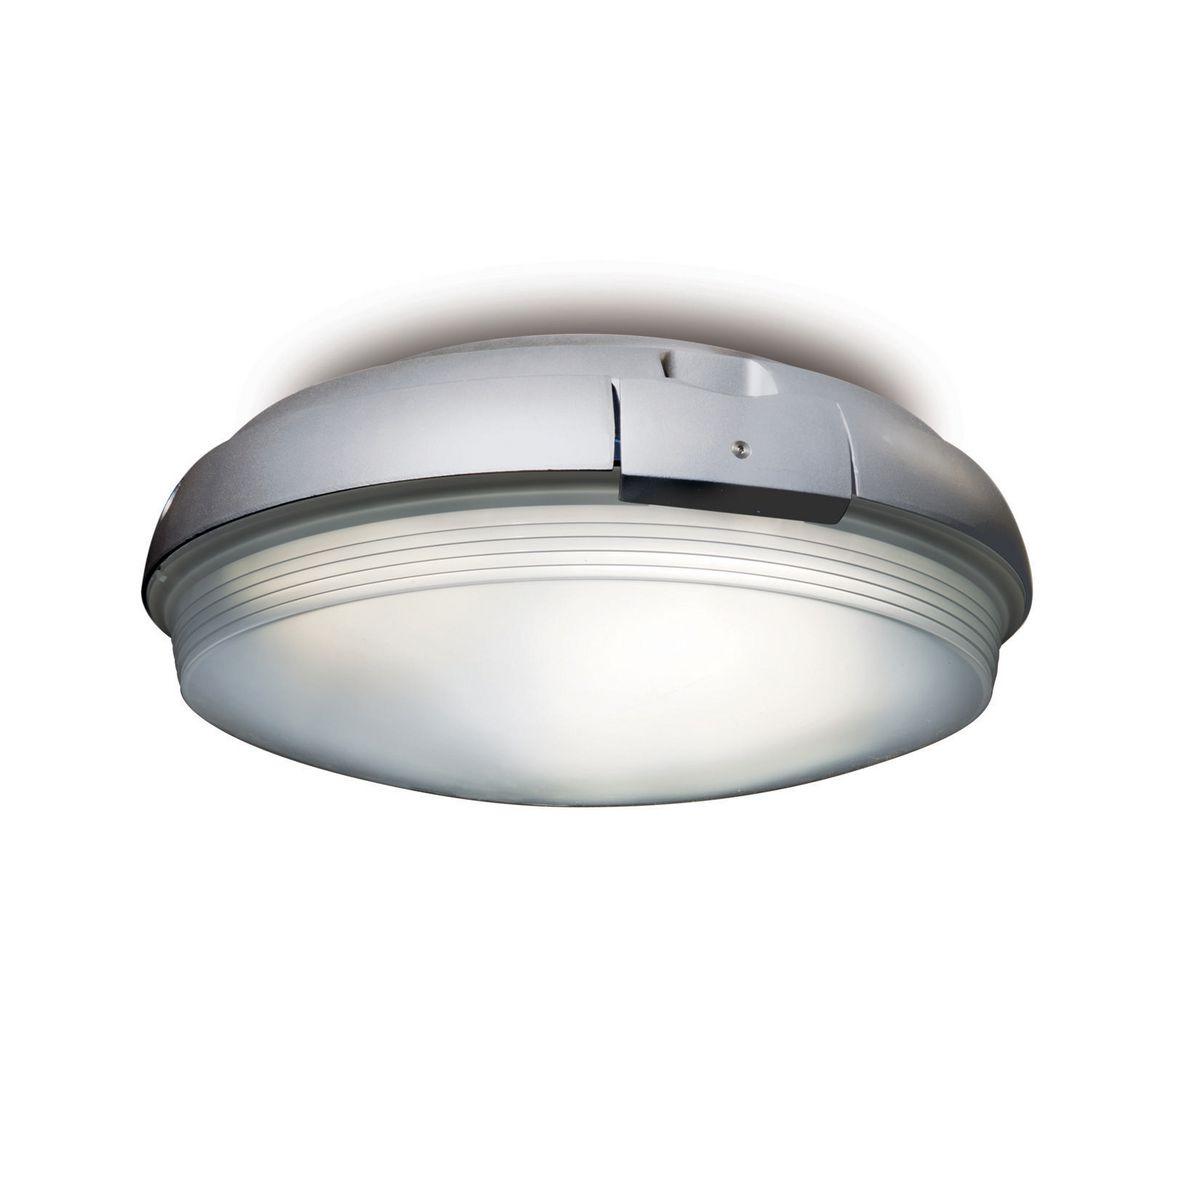 Pgl7 led ceiling canopy garage commercial outdoor lighting kimpgl7difuseprodimage kimpgl7difuseprodimage klpgl7prodimage arubaitofo Choice Image